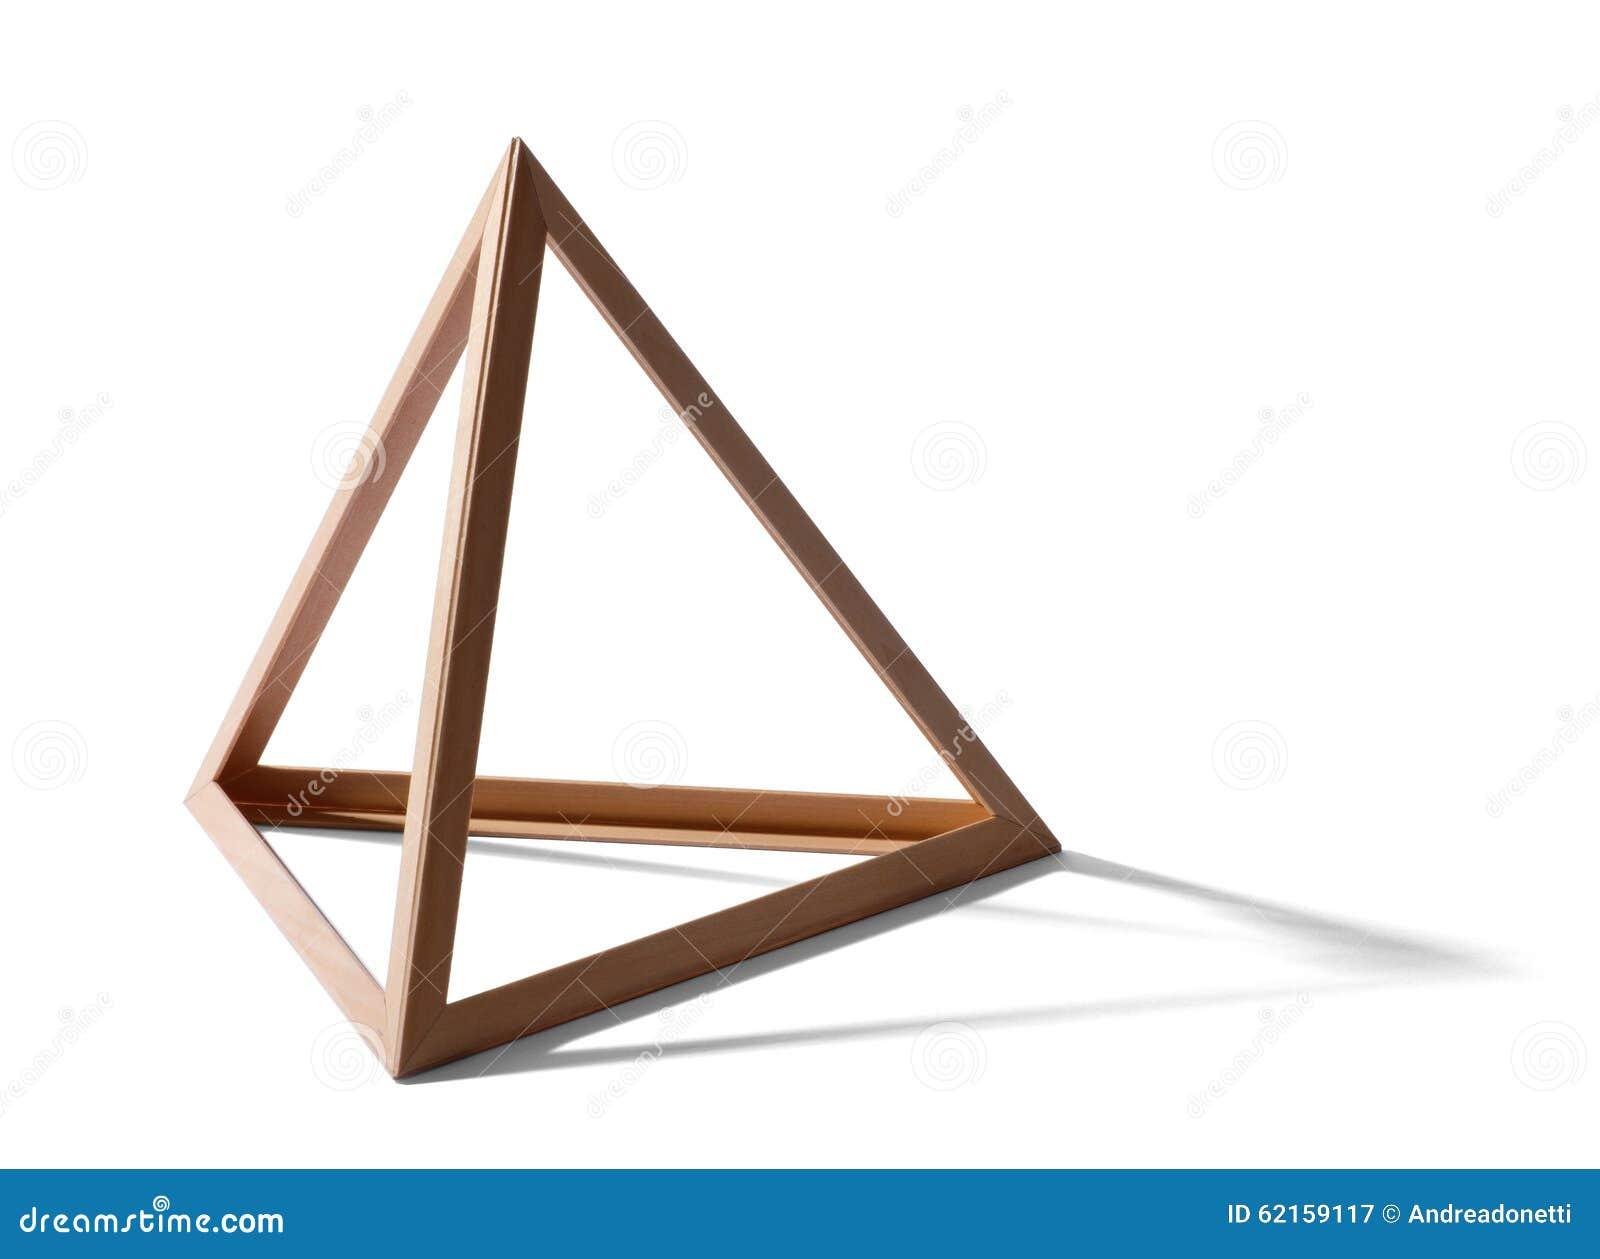 empty triangular frame